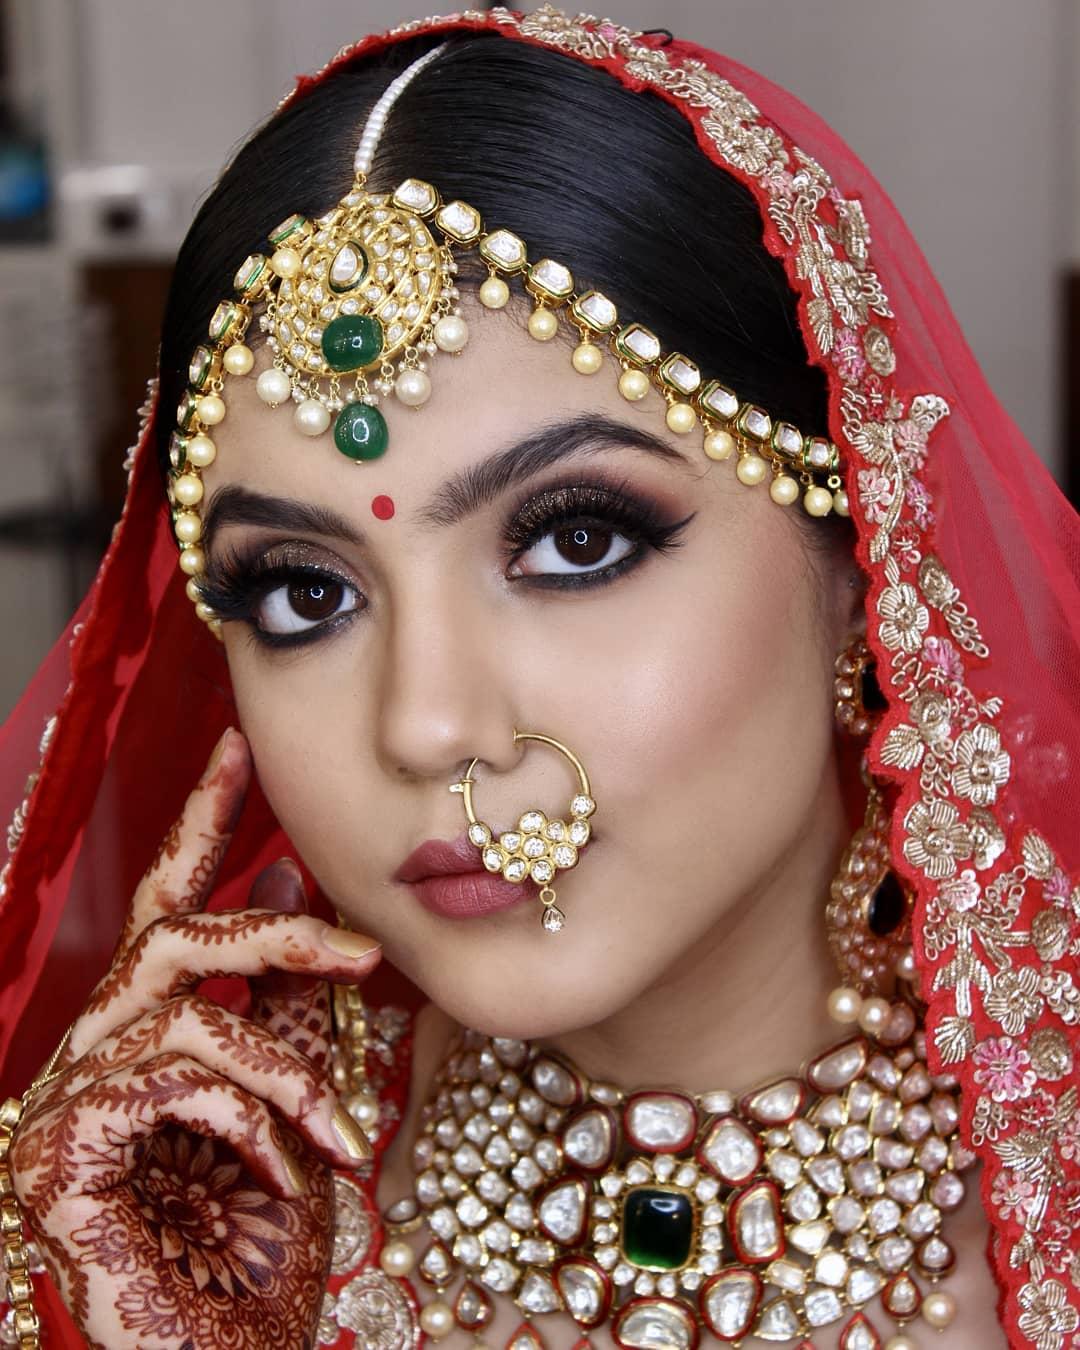 shweta-kokra-makeup-artist-delhi-ncr